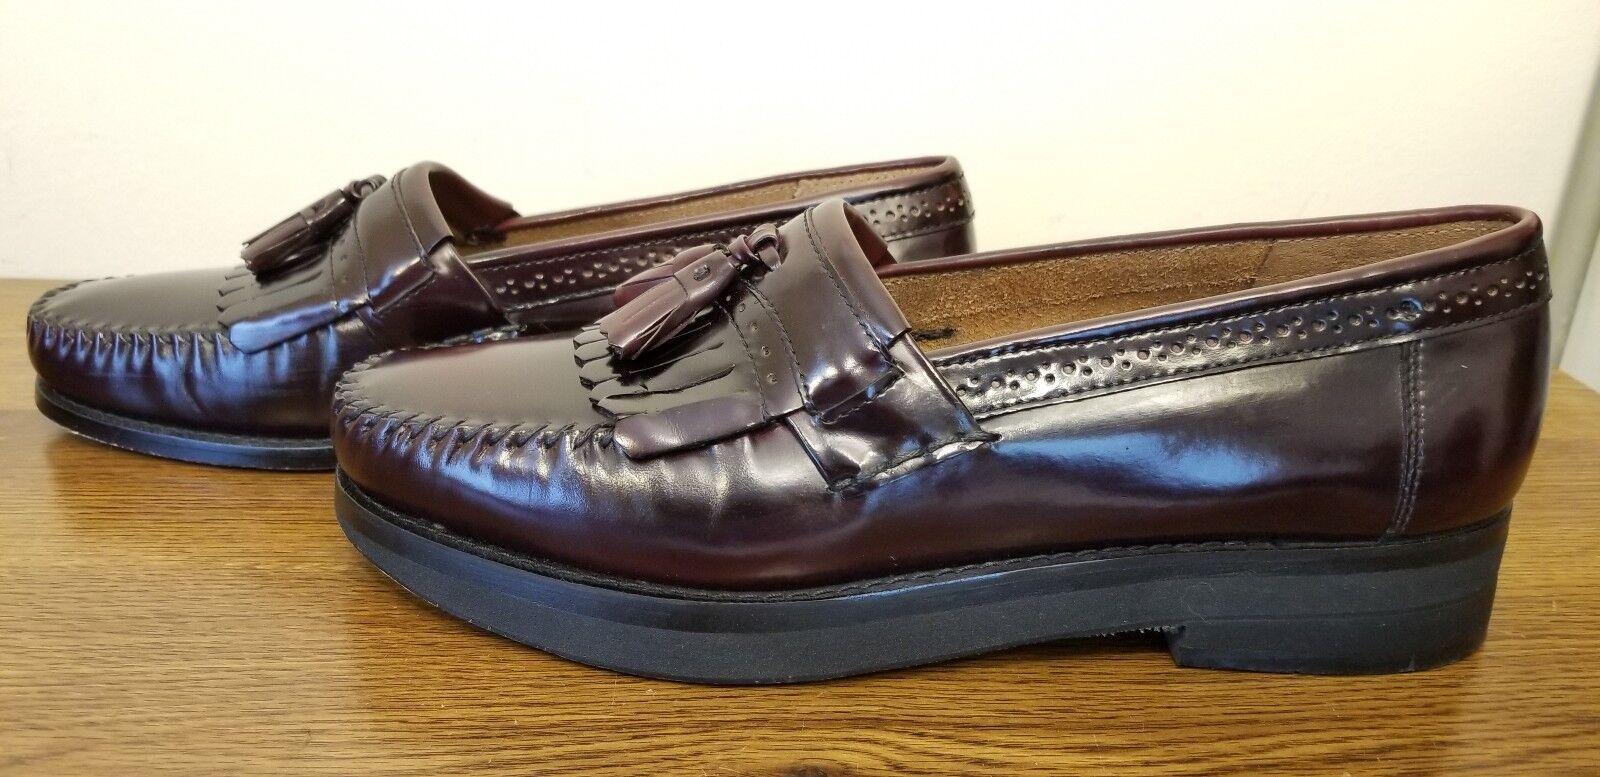 WEEJUNS By G H Bass Burgundy Kiltie Tassel  Loafers 11 D - LLD LEG DISCREPANCY